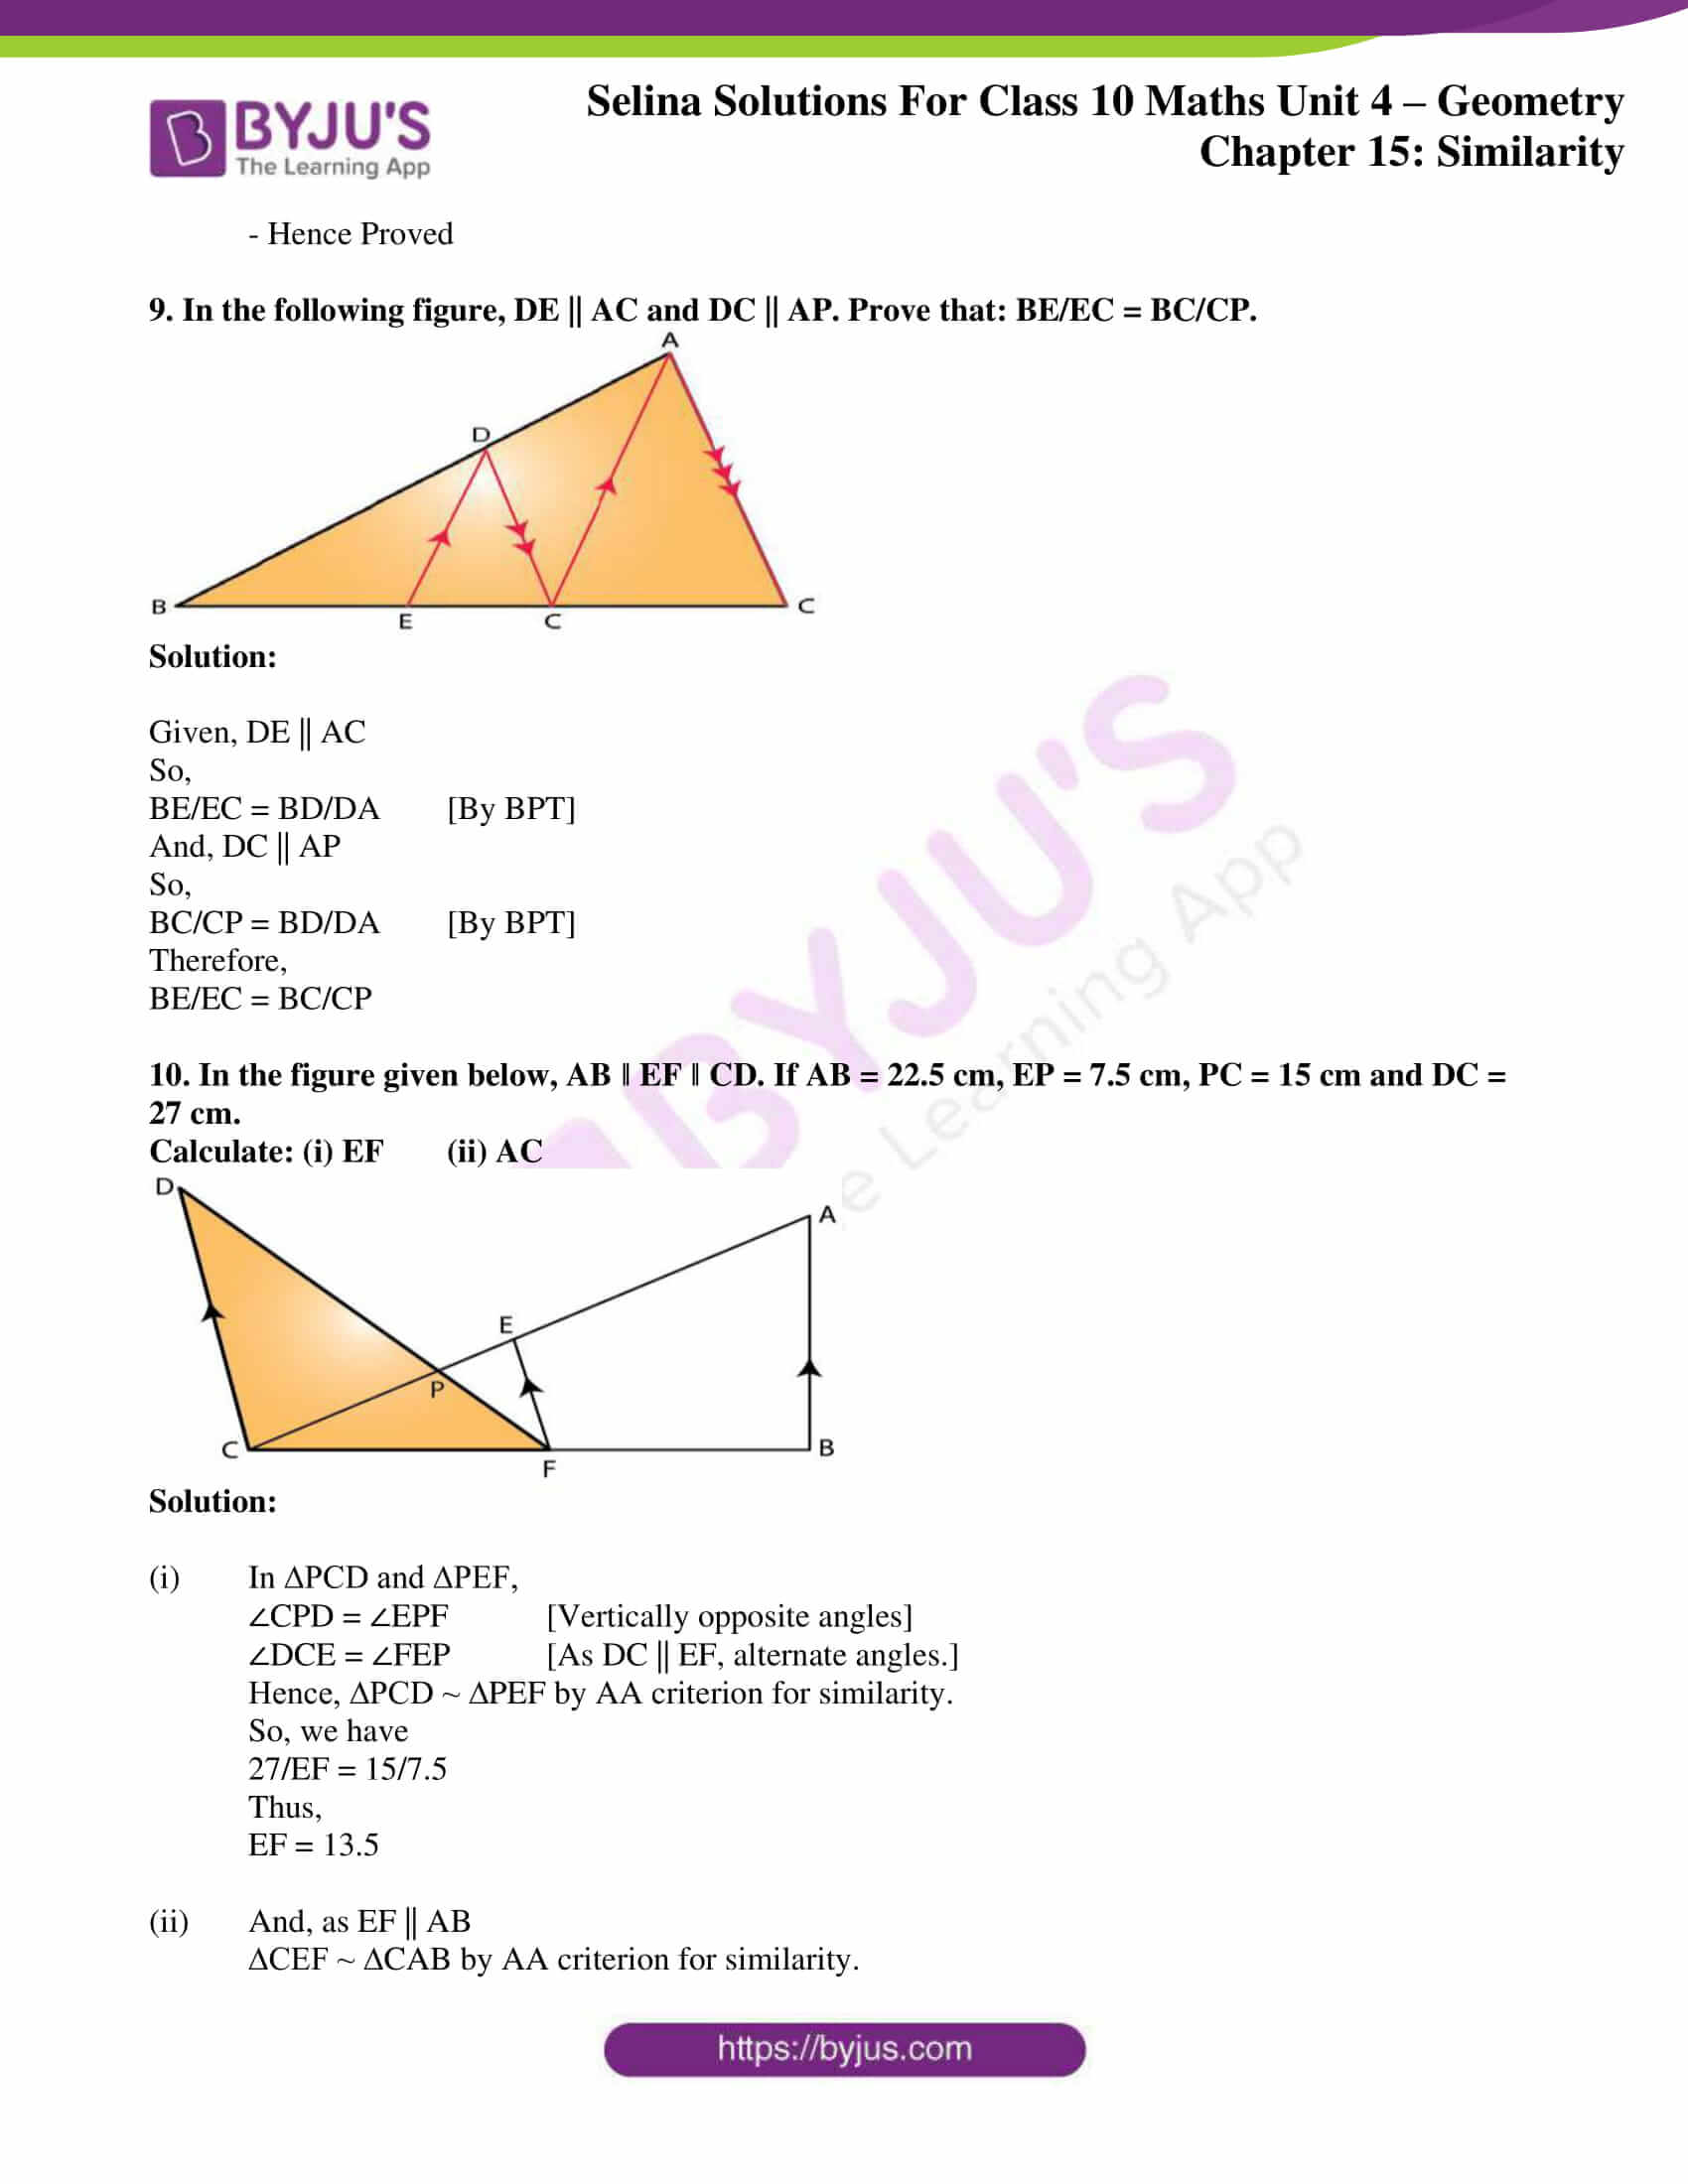 selina-sol-maths-class-10-ch-15-ex-e-6